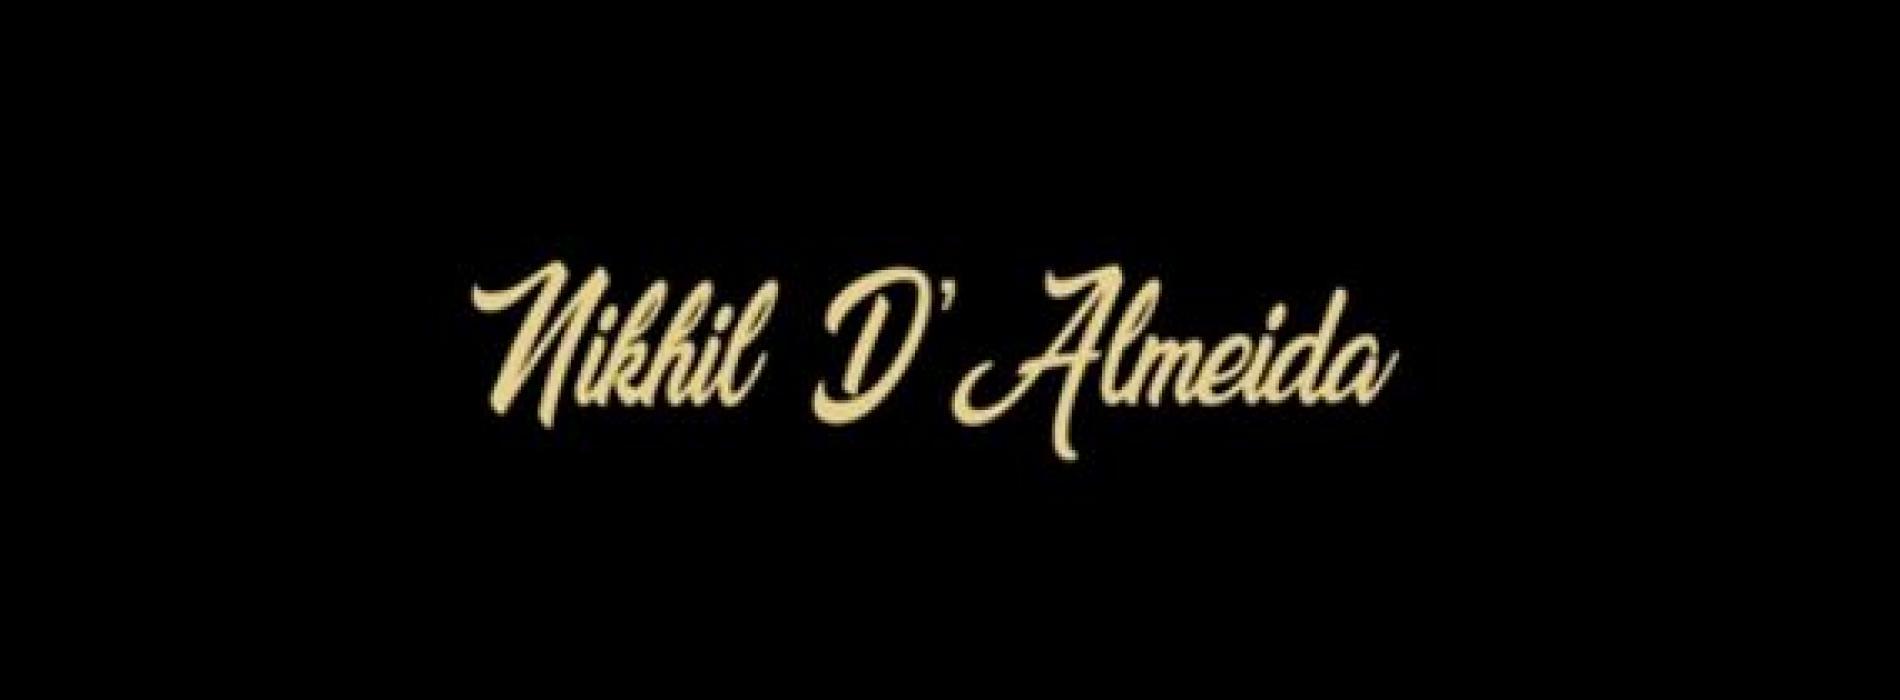 Nikhil D' Almeida – Girls Like You (cover)